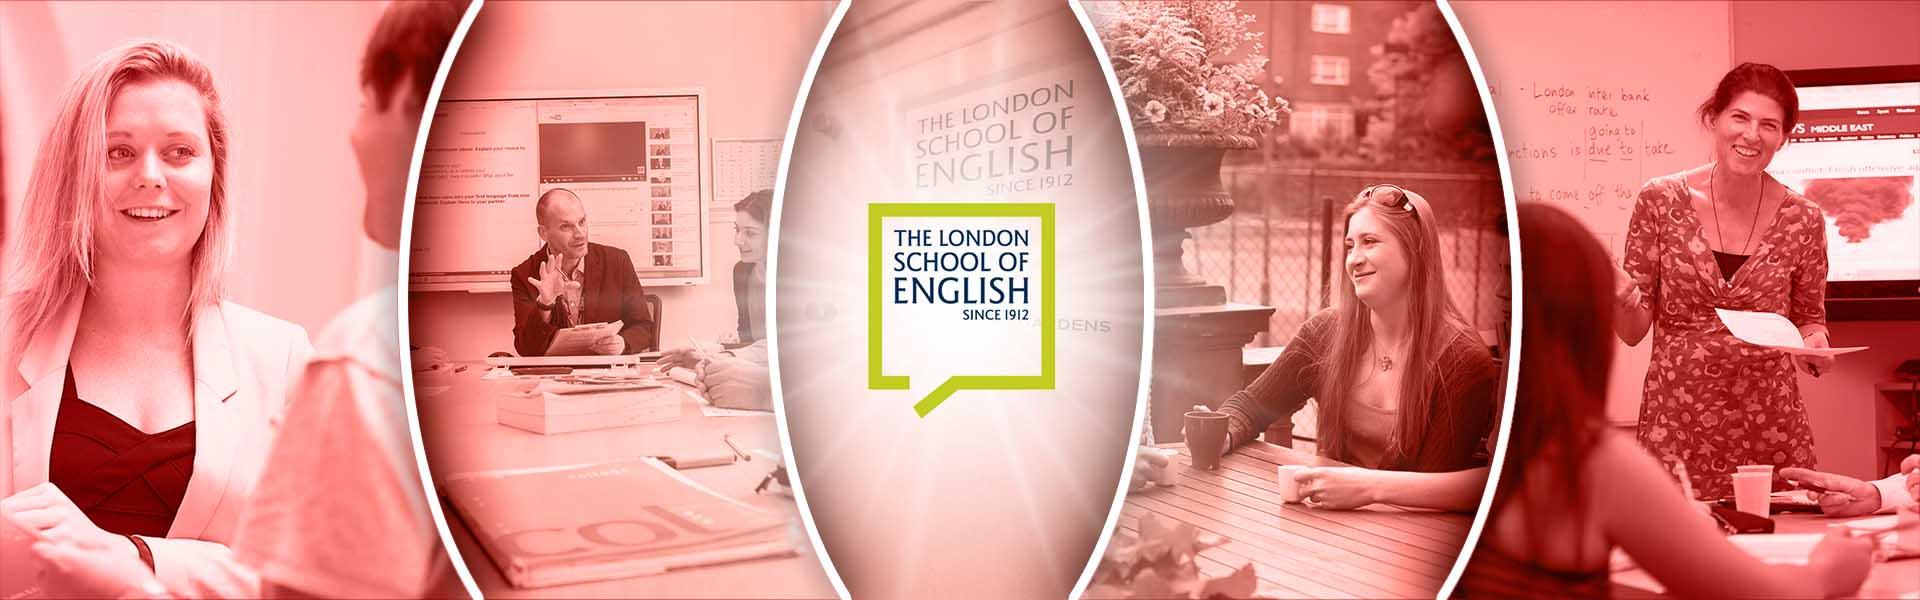 London School of English Dil Okulu